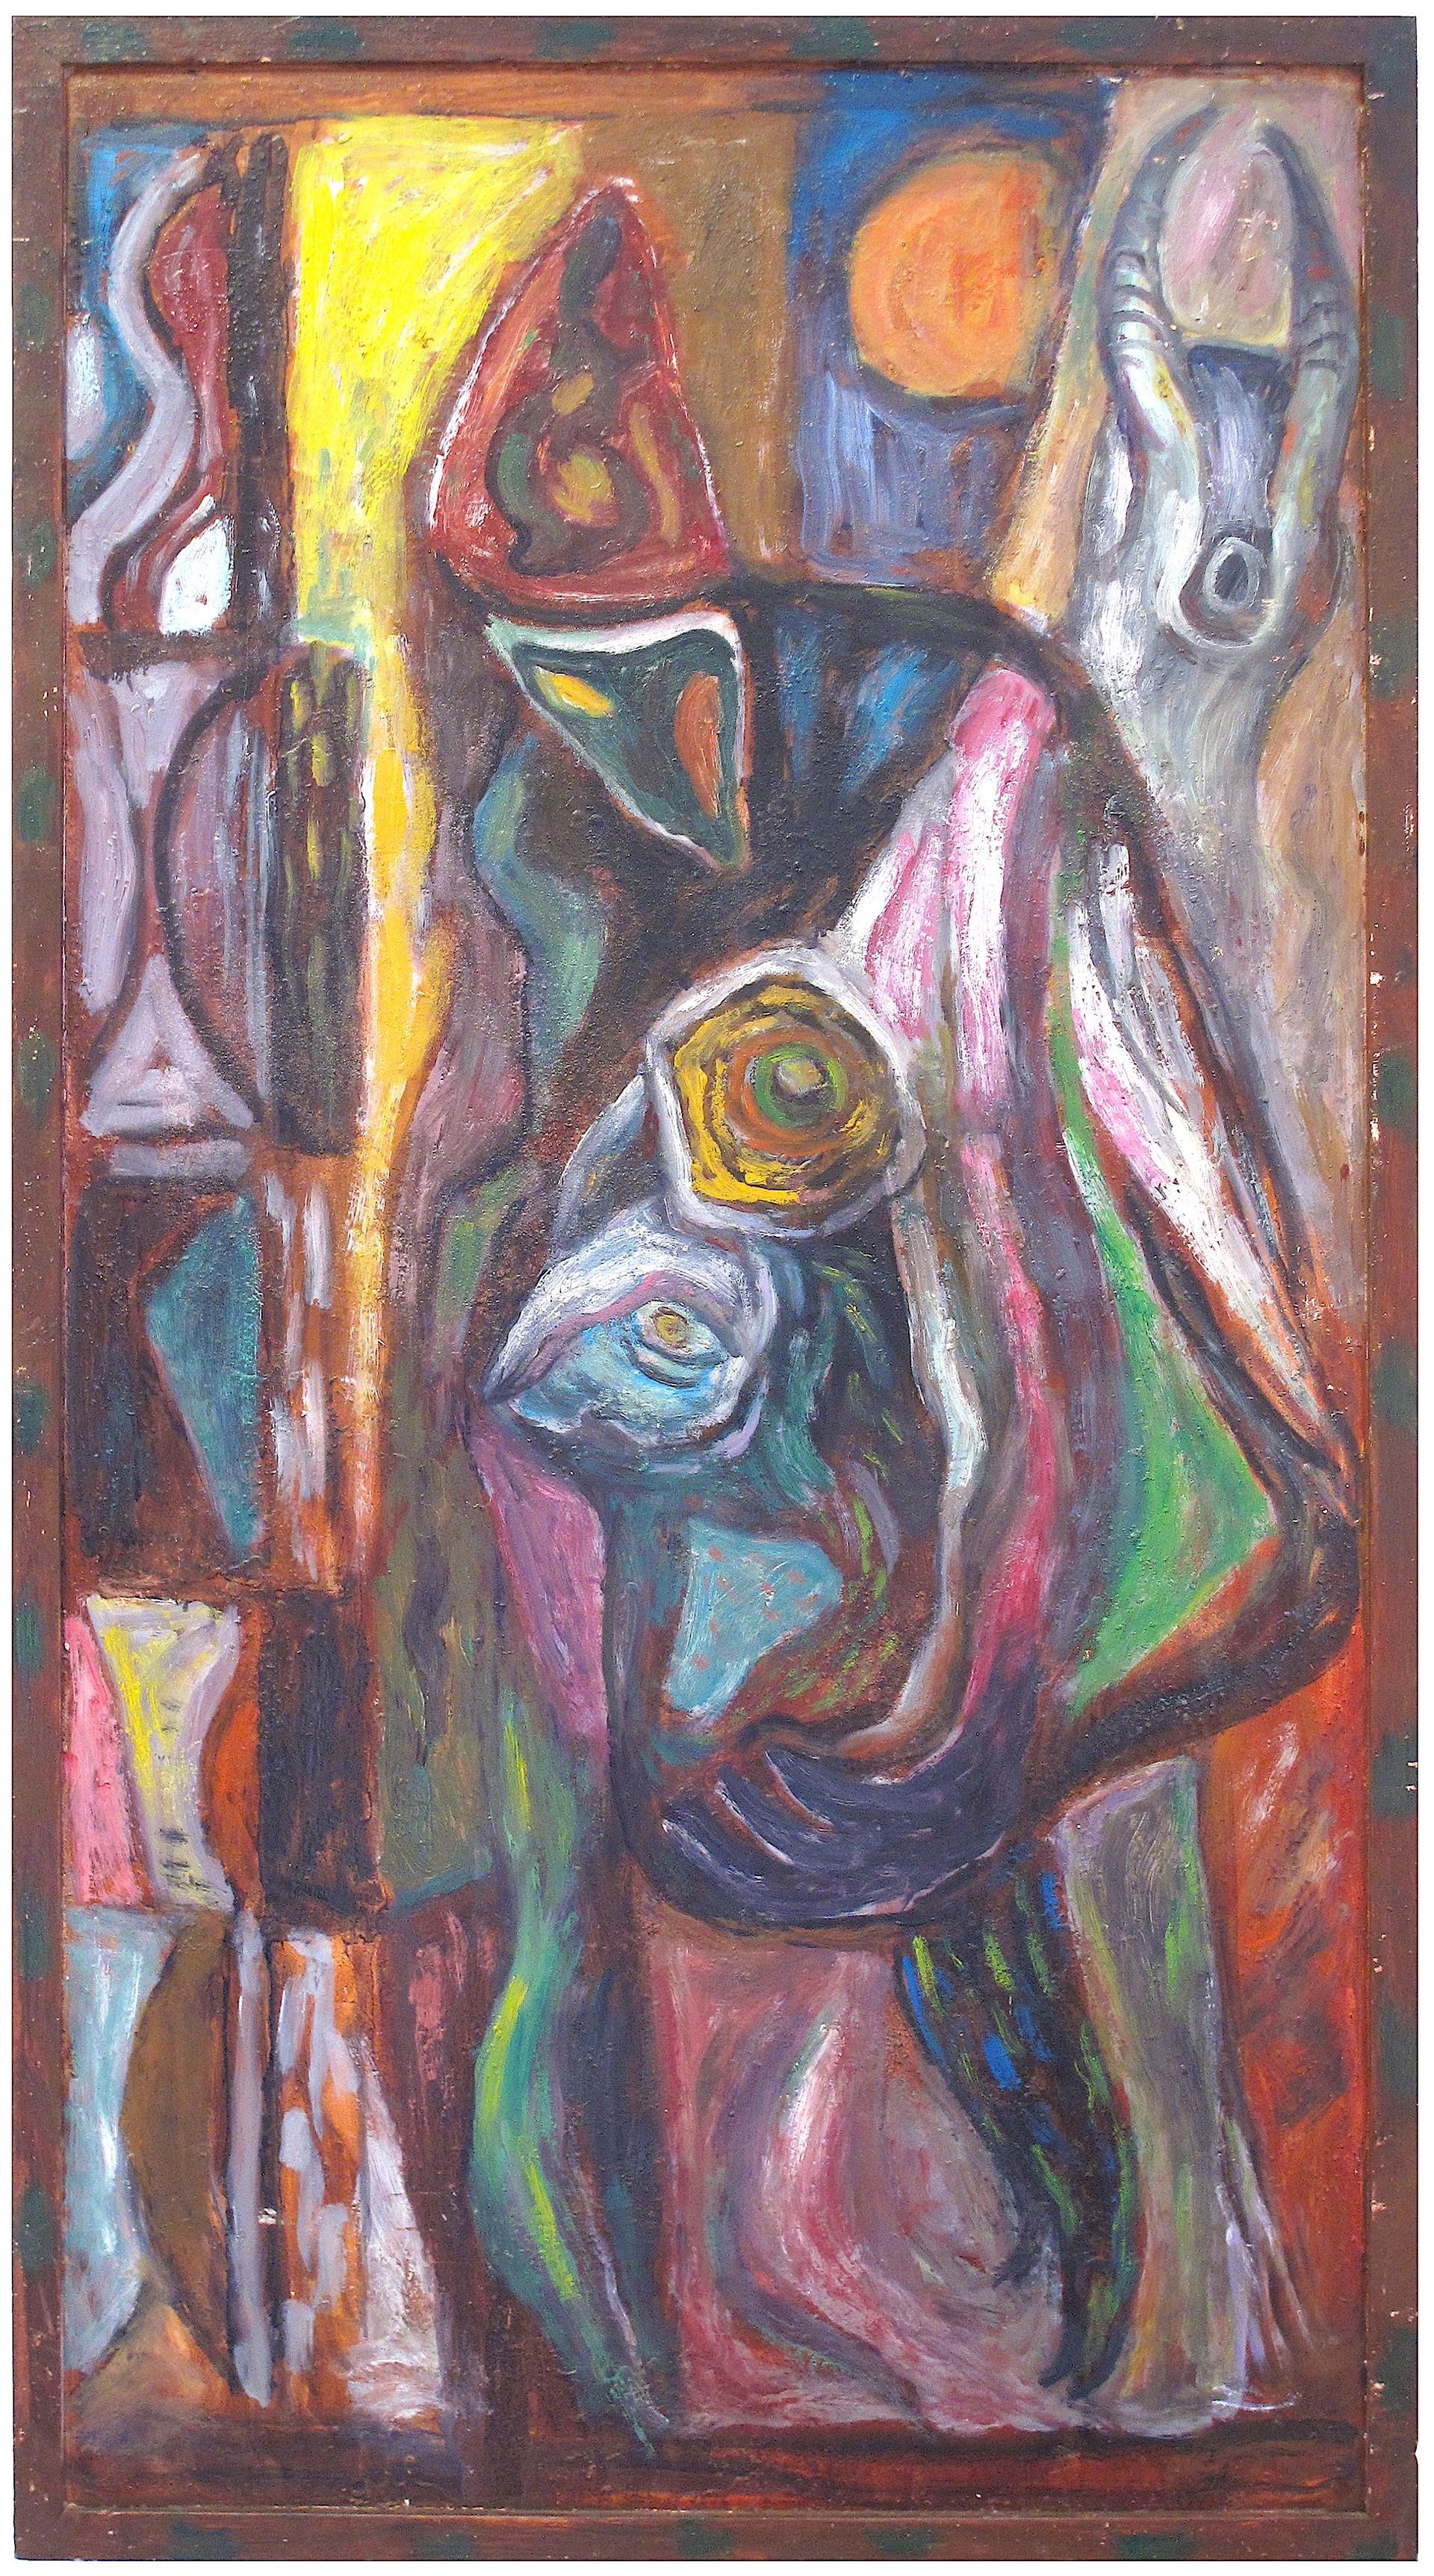 The Magician by Judith Deim